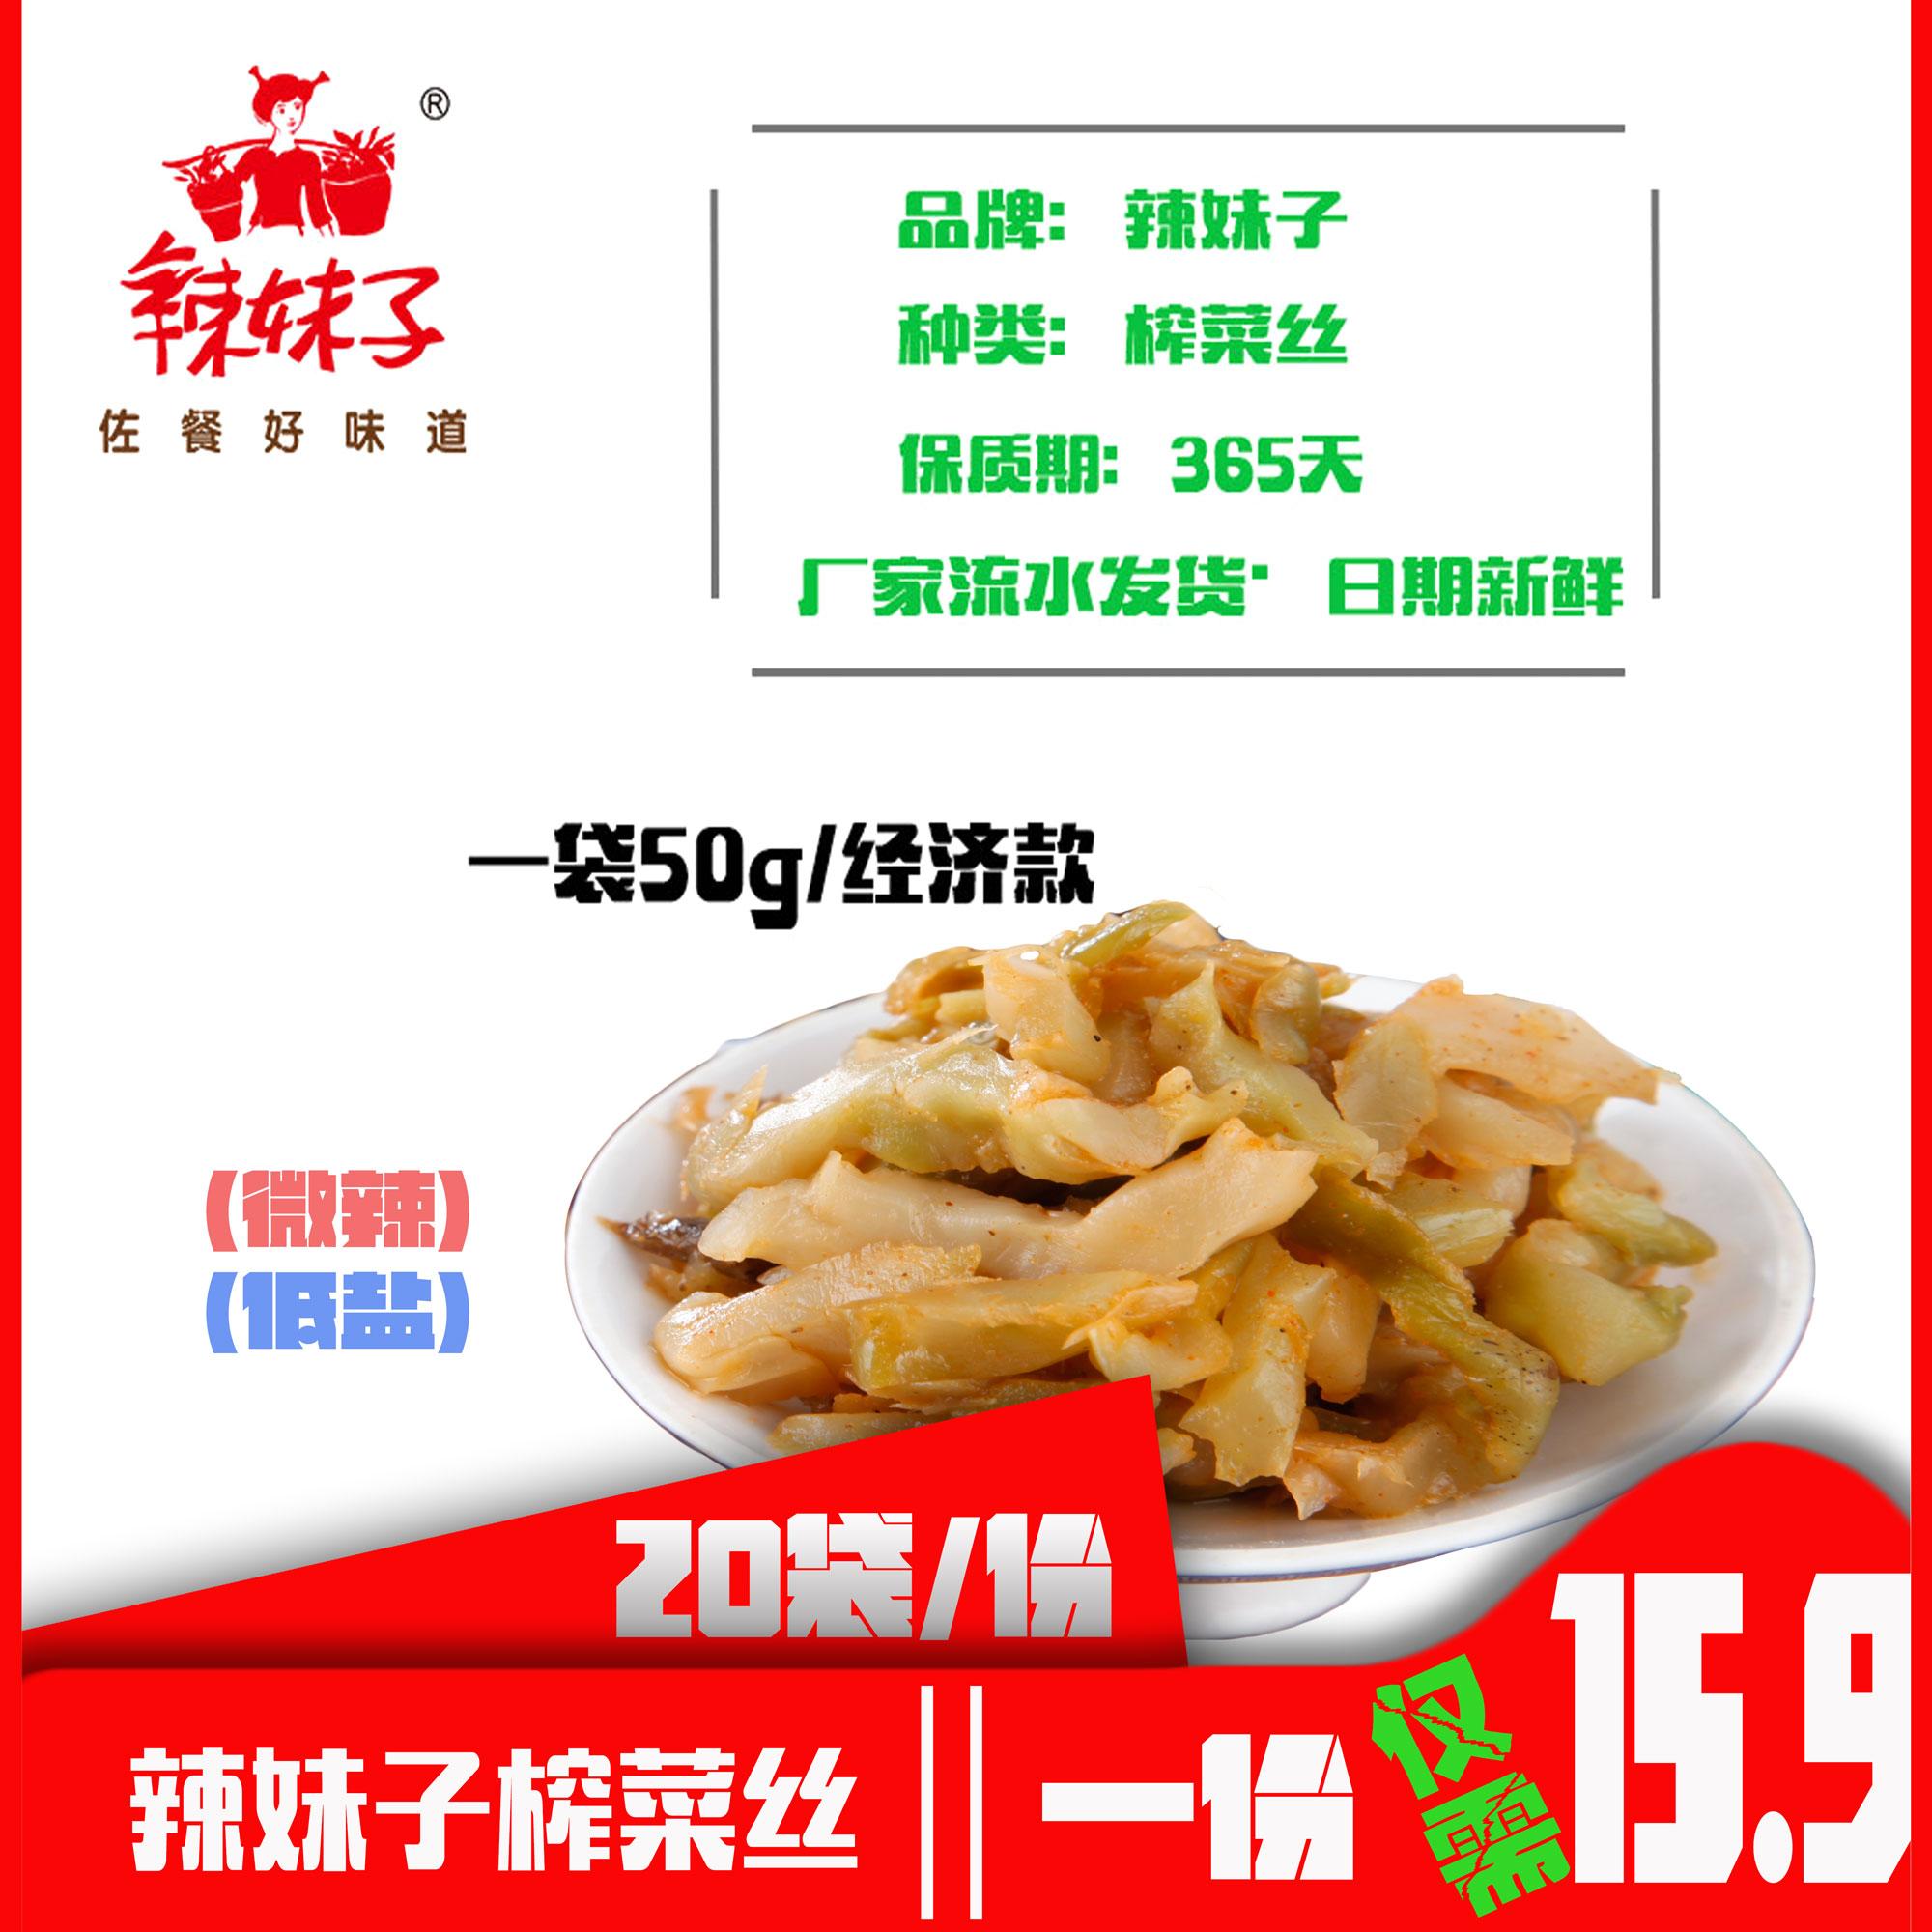 (1000g涪陵榨菜)辣妹子榨菜丝 经济版小包装下饭菜  开胃菜20袋